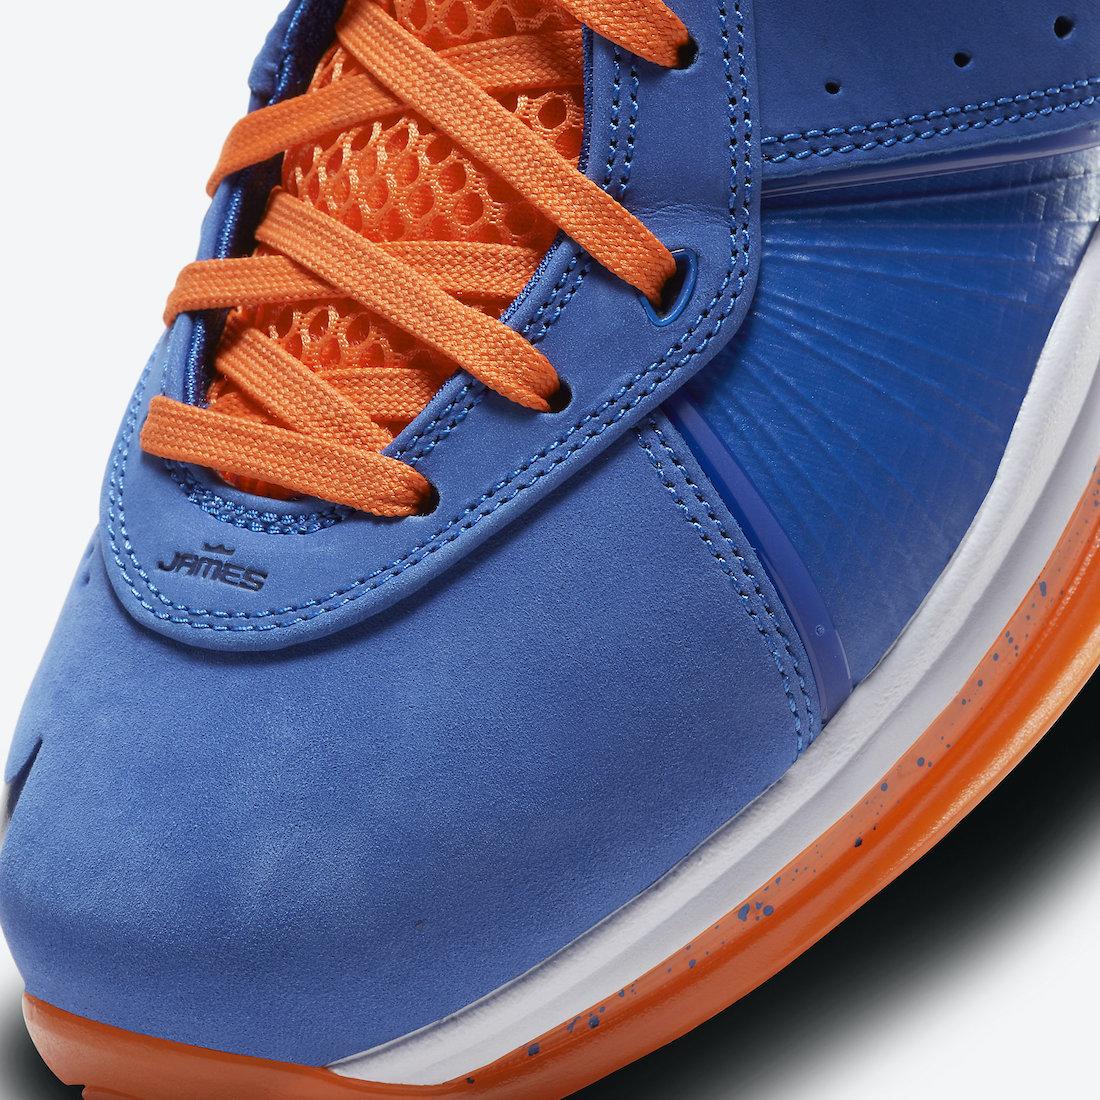 Nike-LeBron-8-HWC-Hardwood-Classic-CV1750-400-2021-Release-Date-Price-6